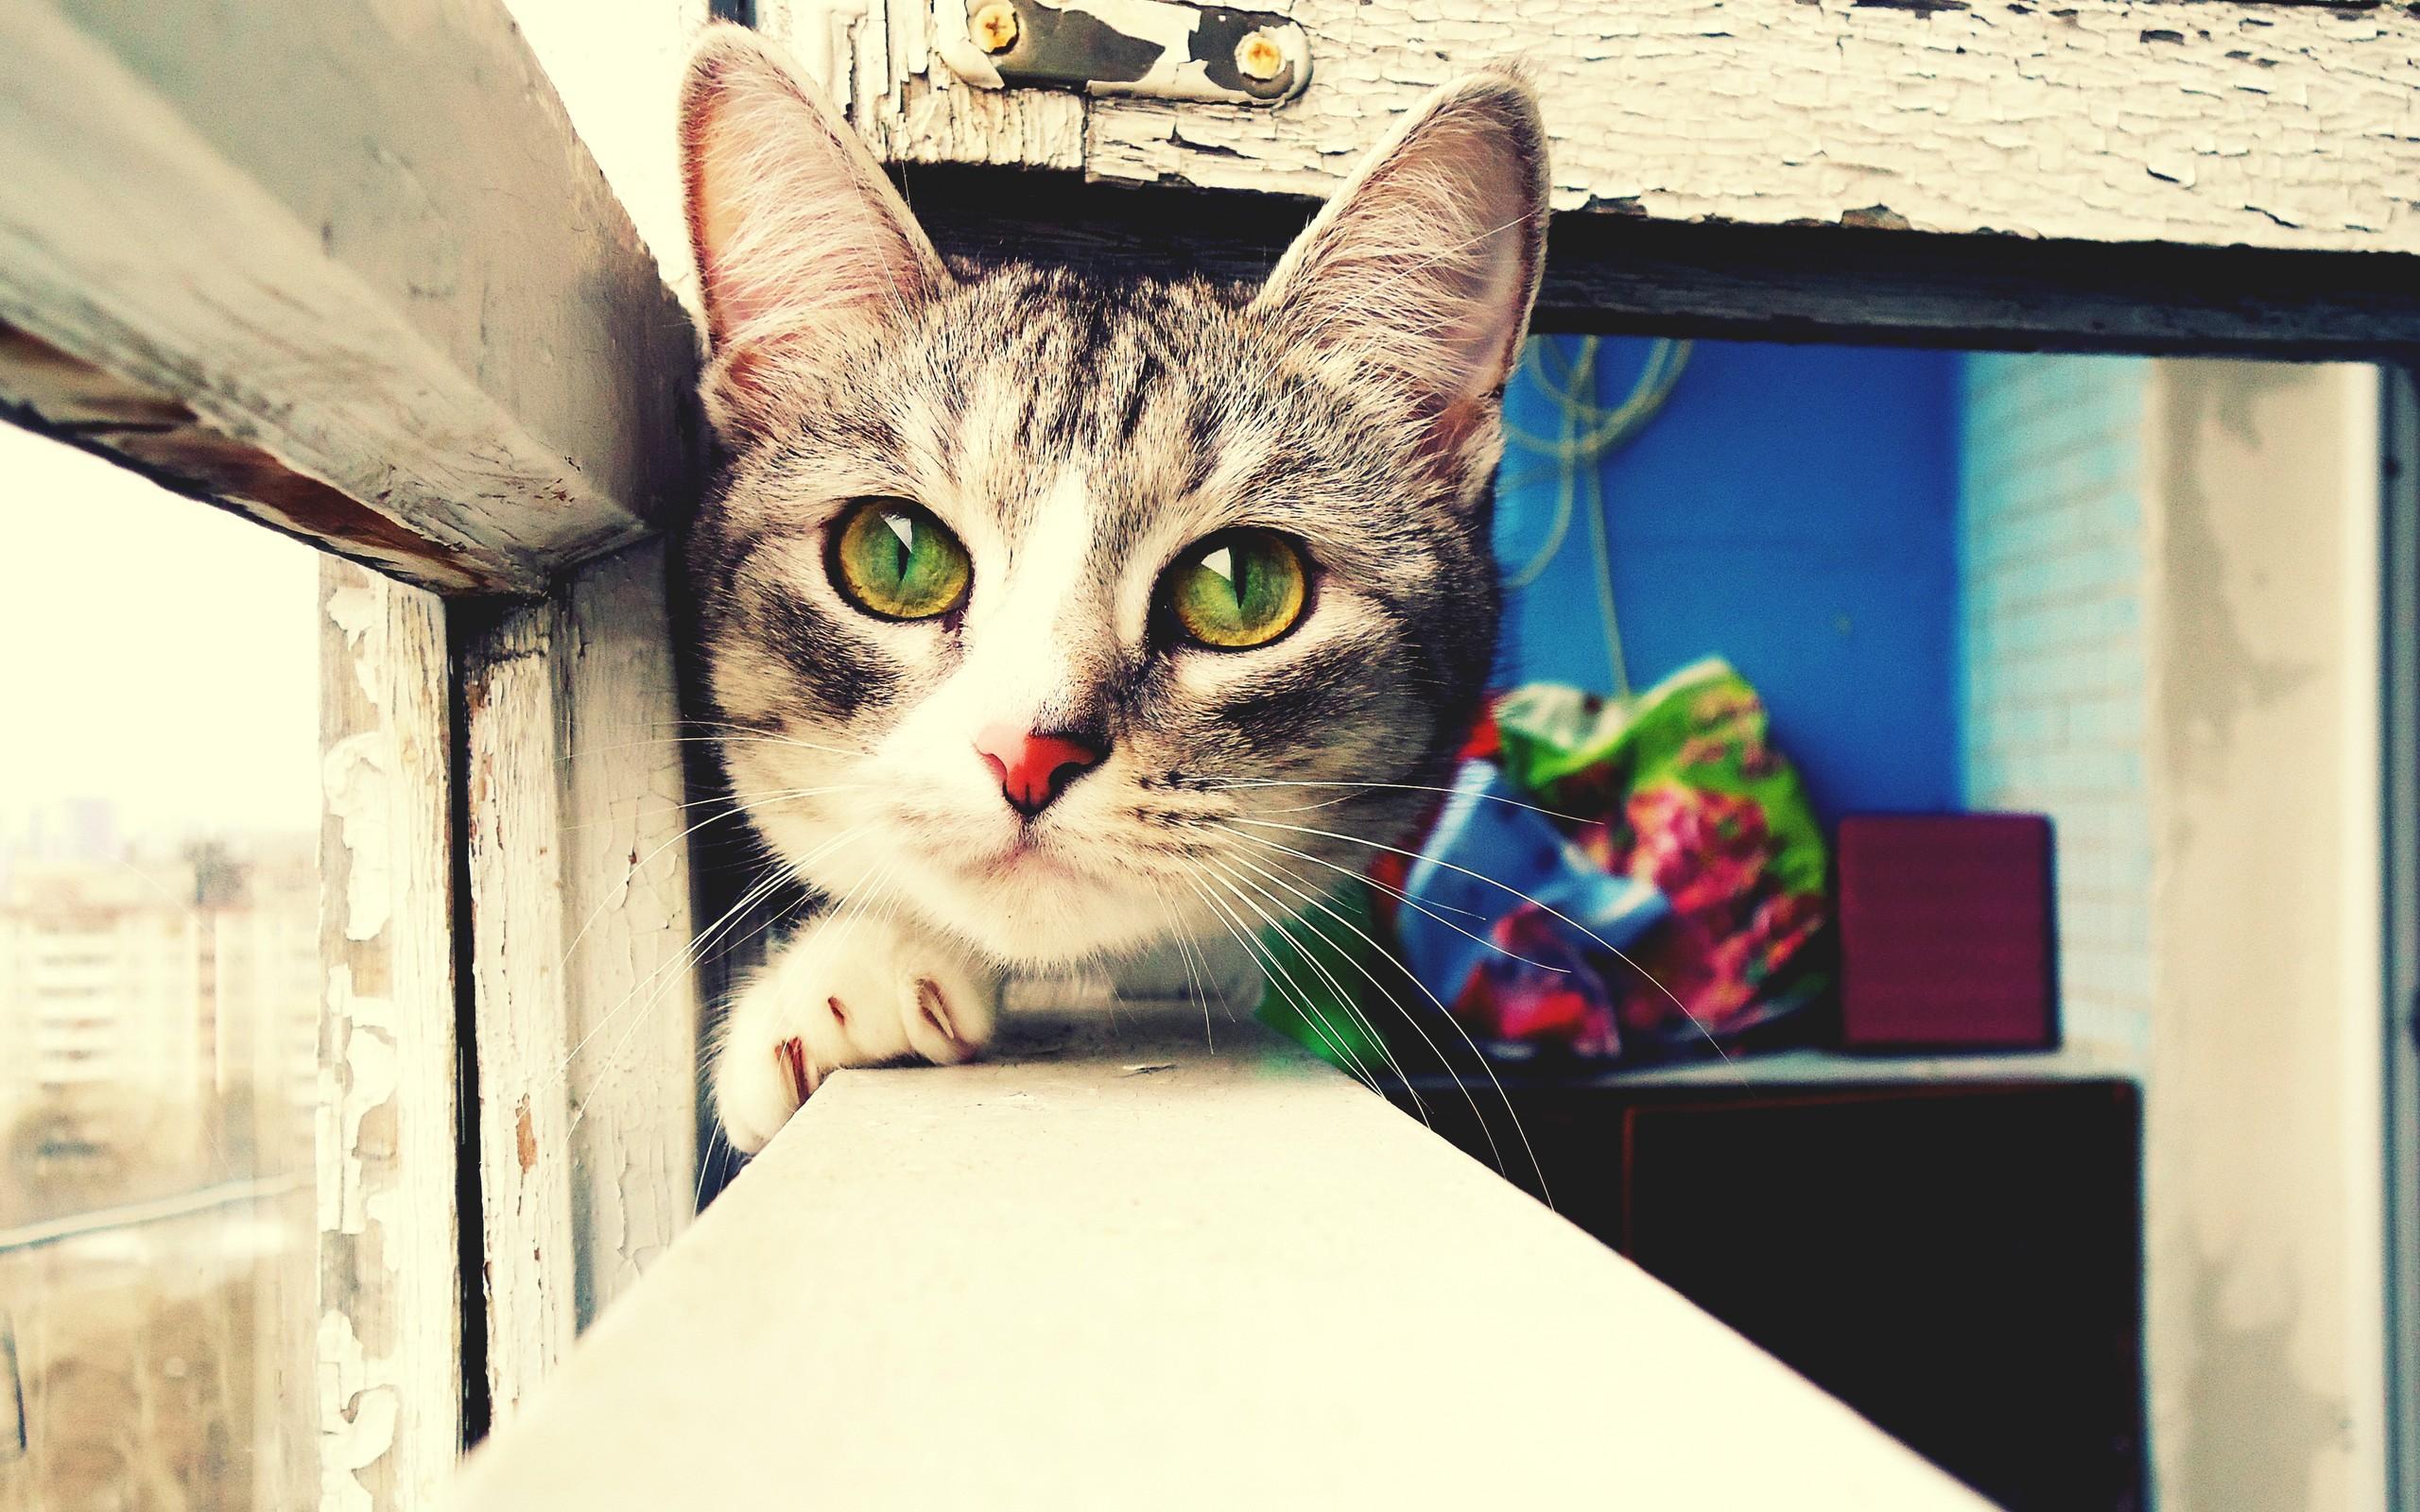 Foto artística de gatos - 2560x1600